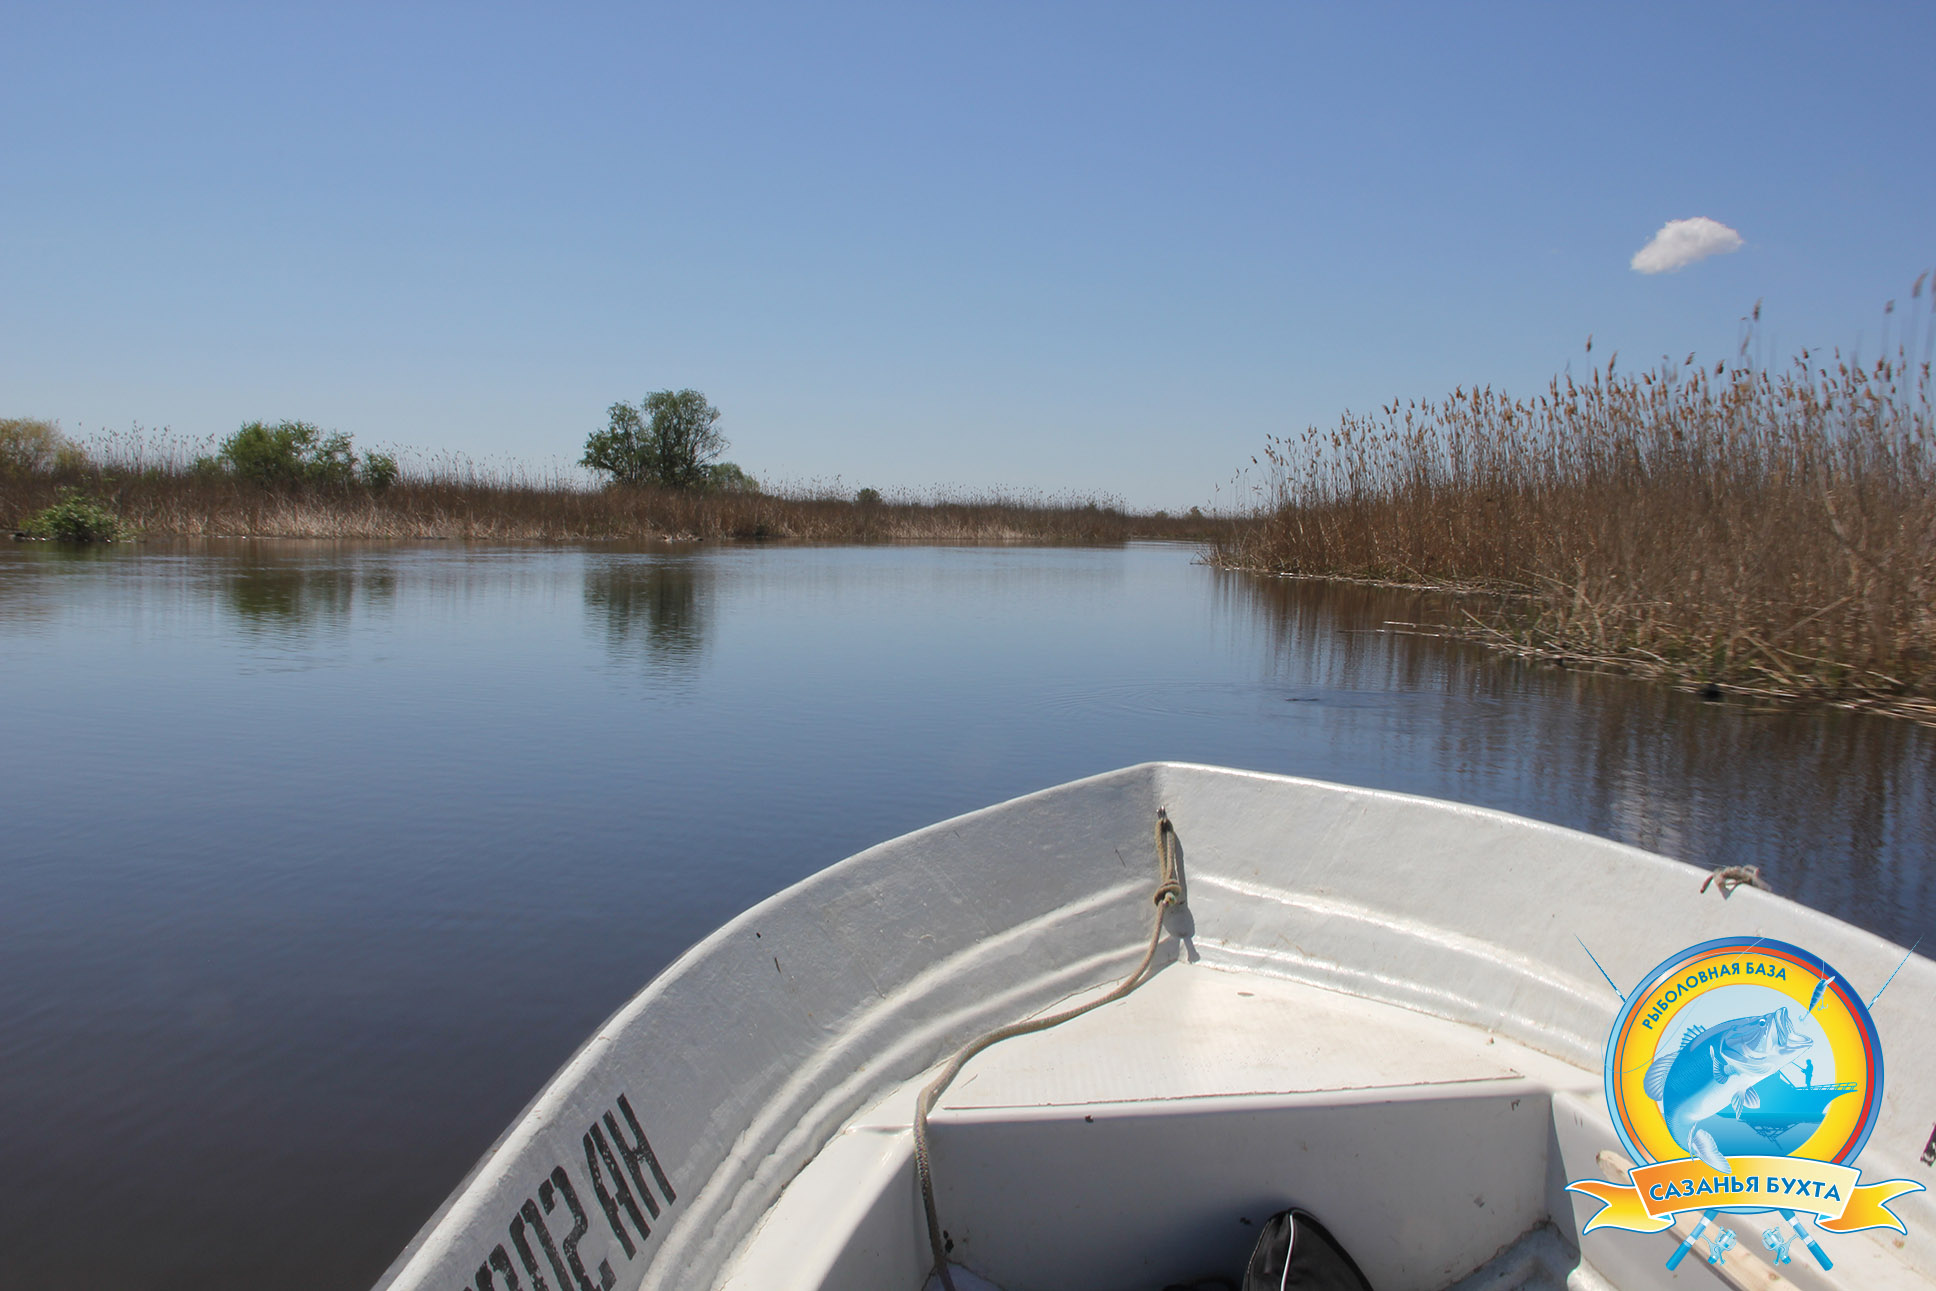 Рыболовная база отдыха «Сазаний угол»